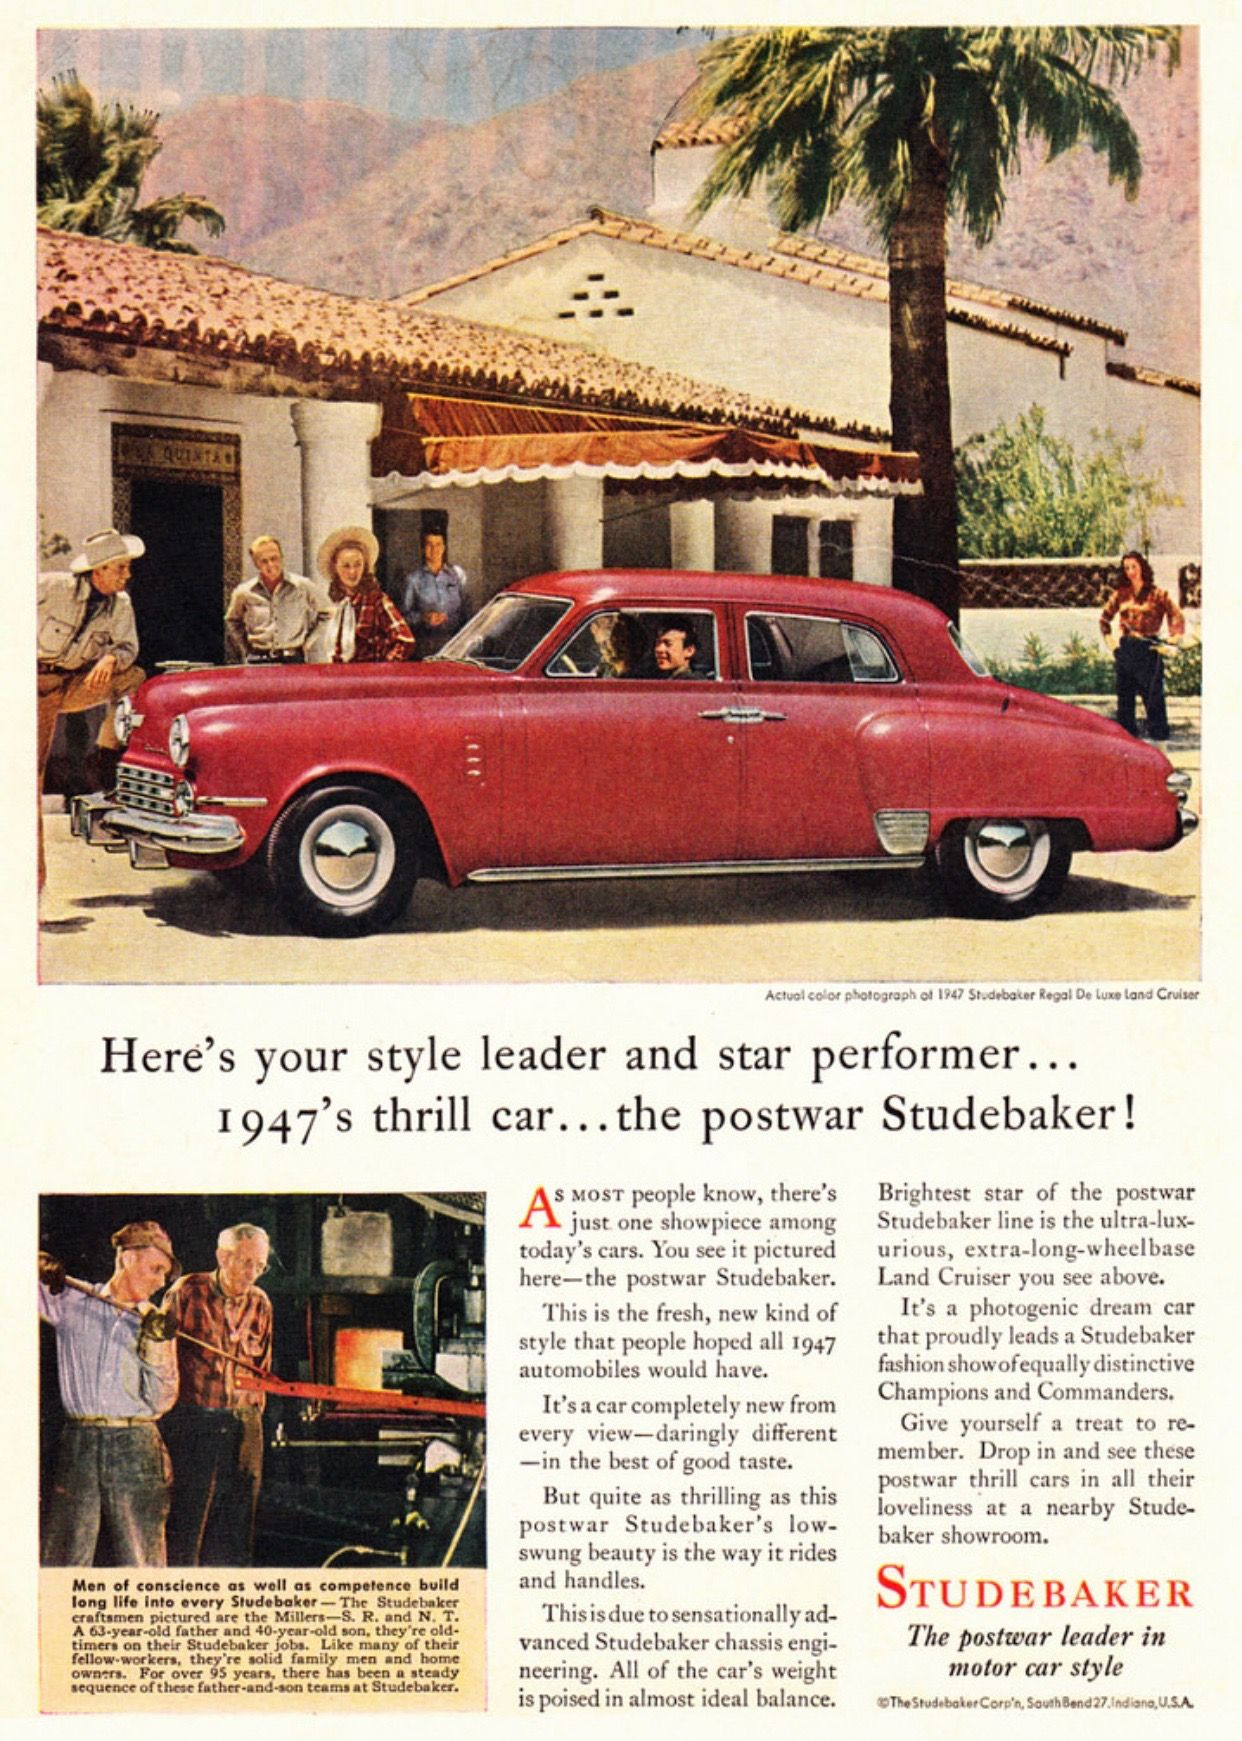 1947 Studebaker - post war | Old Car Adds | Pinterest | Cars